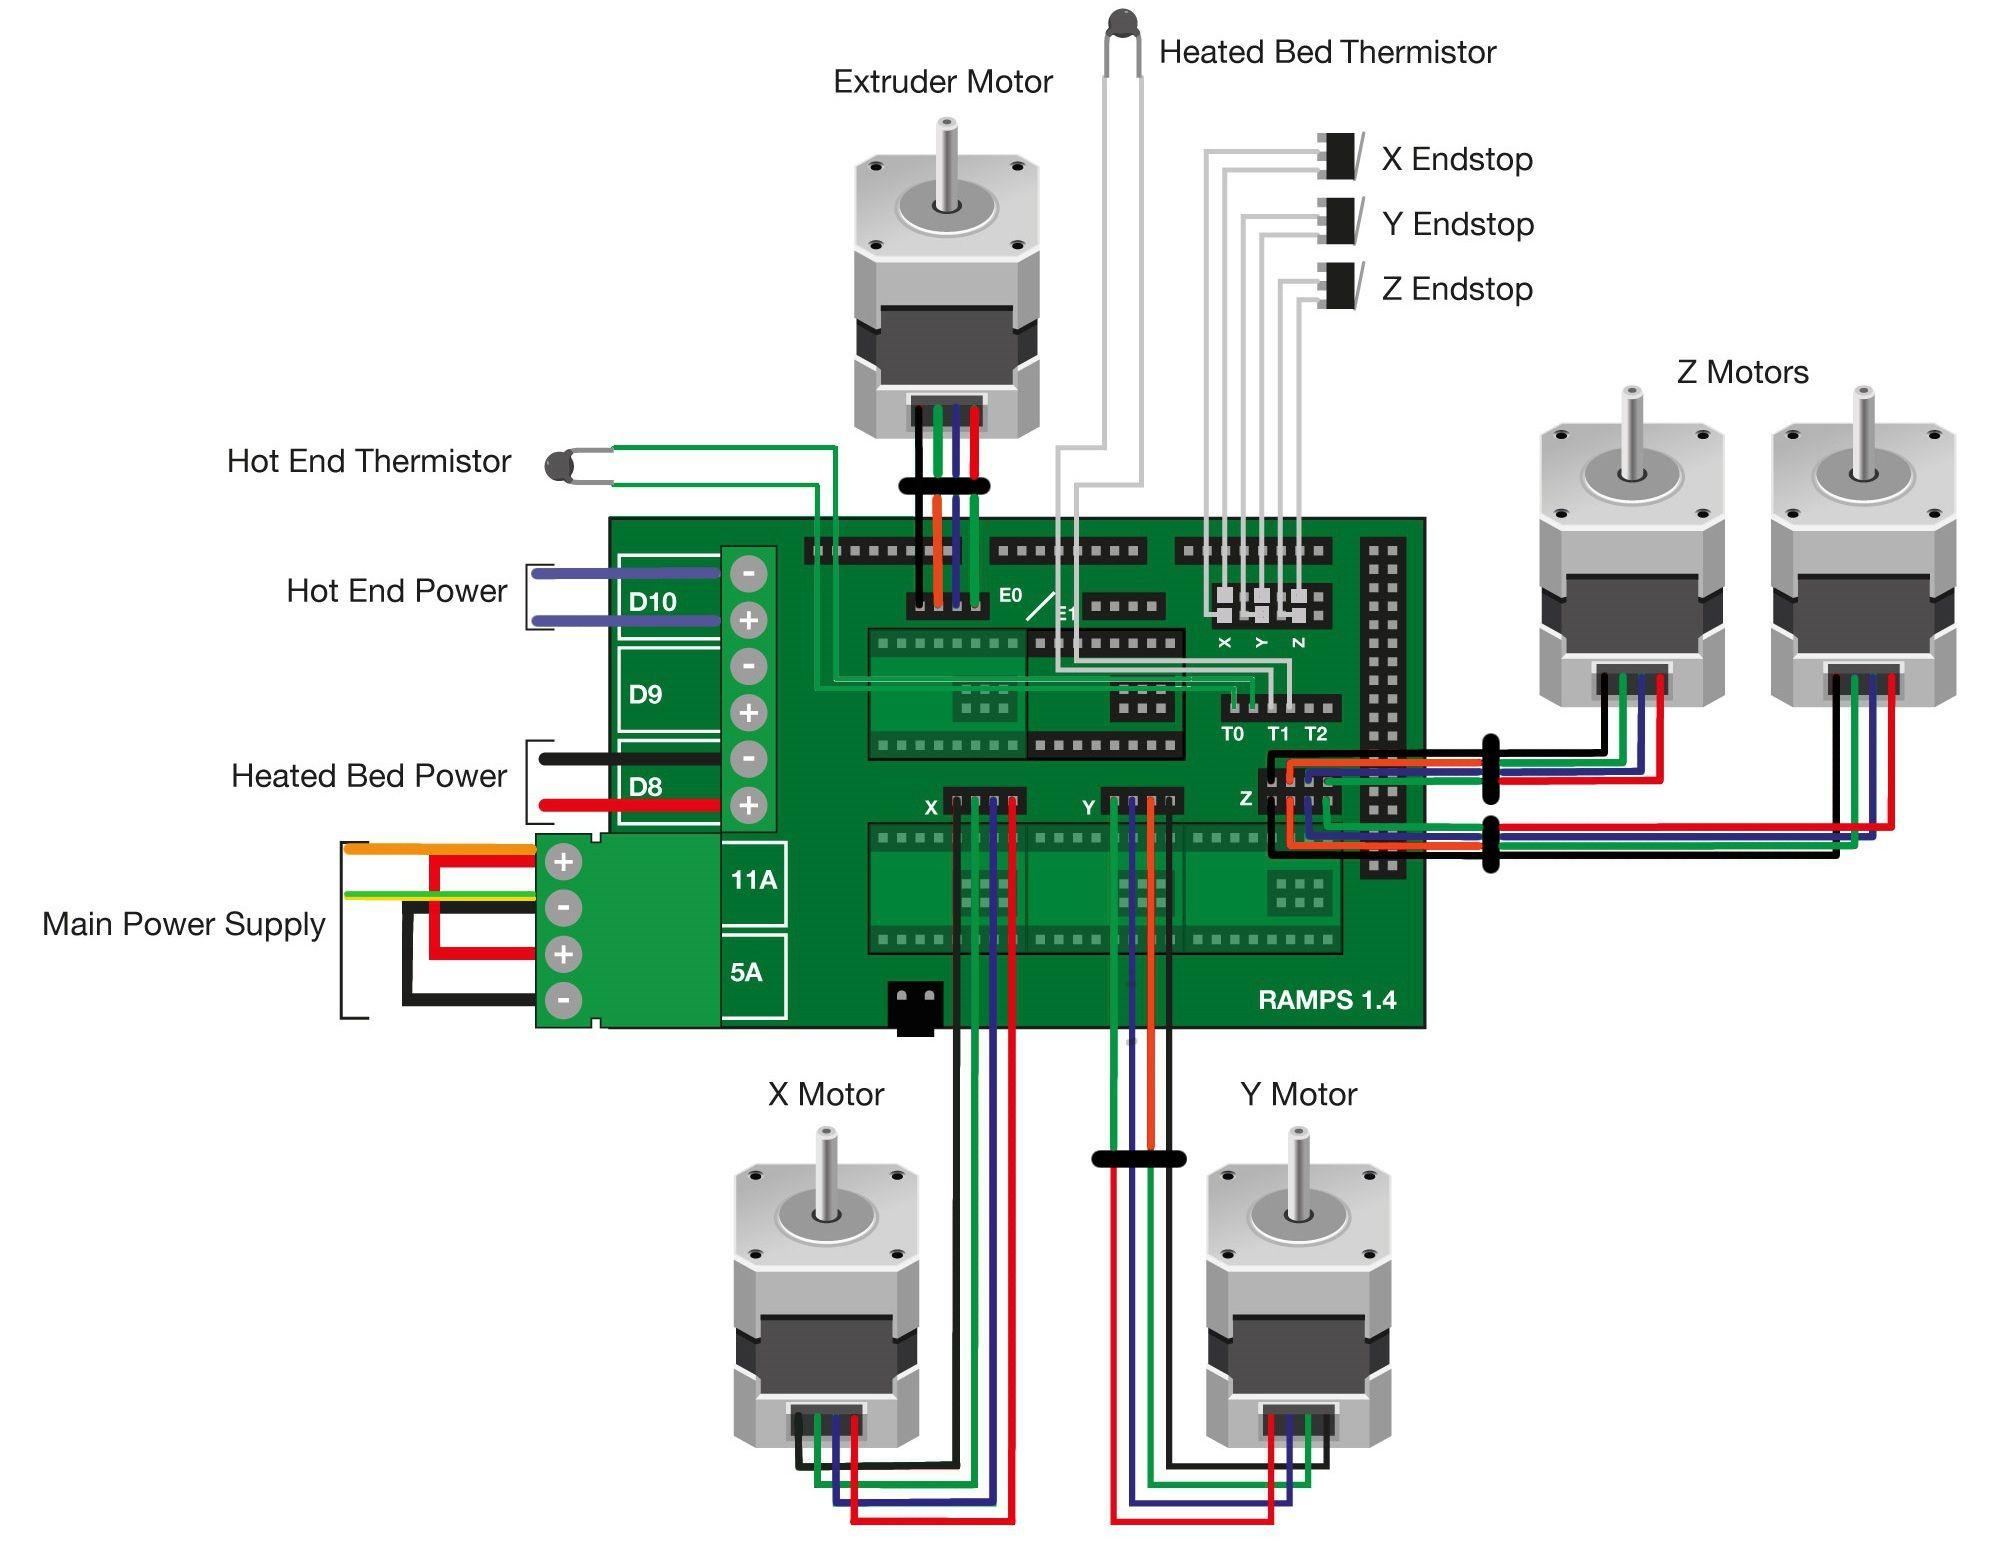 Ramps 1 4 Fan Wiring Diagram | Wiring Library - Ramps 1.4 Wiring Diagram